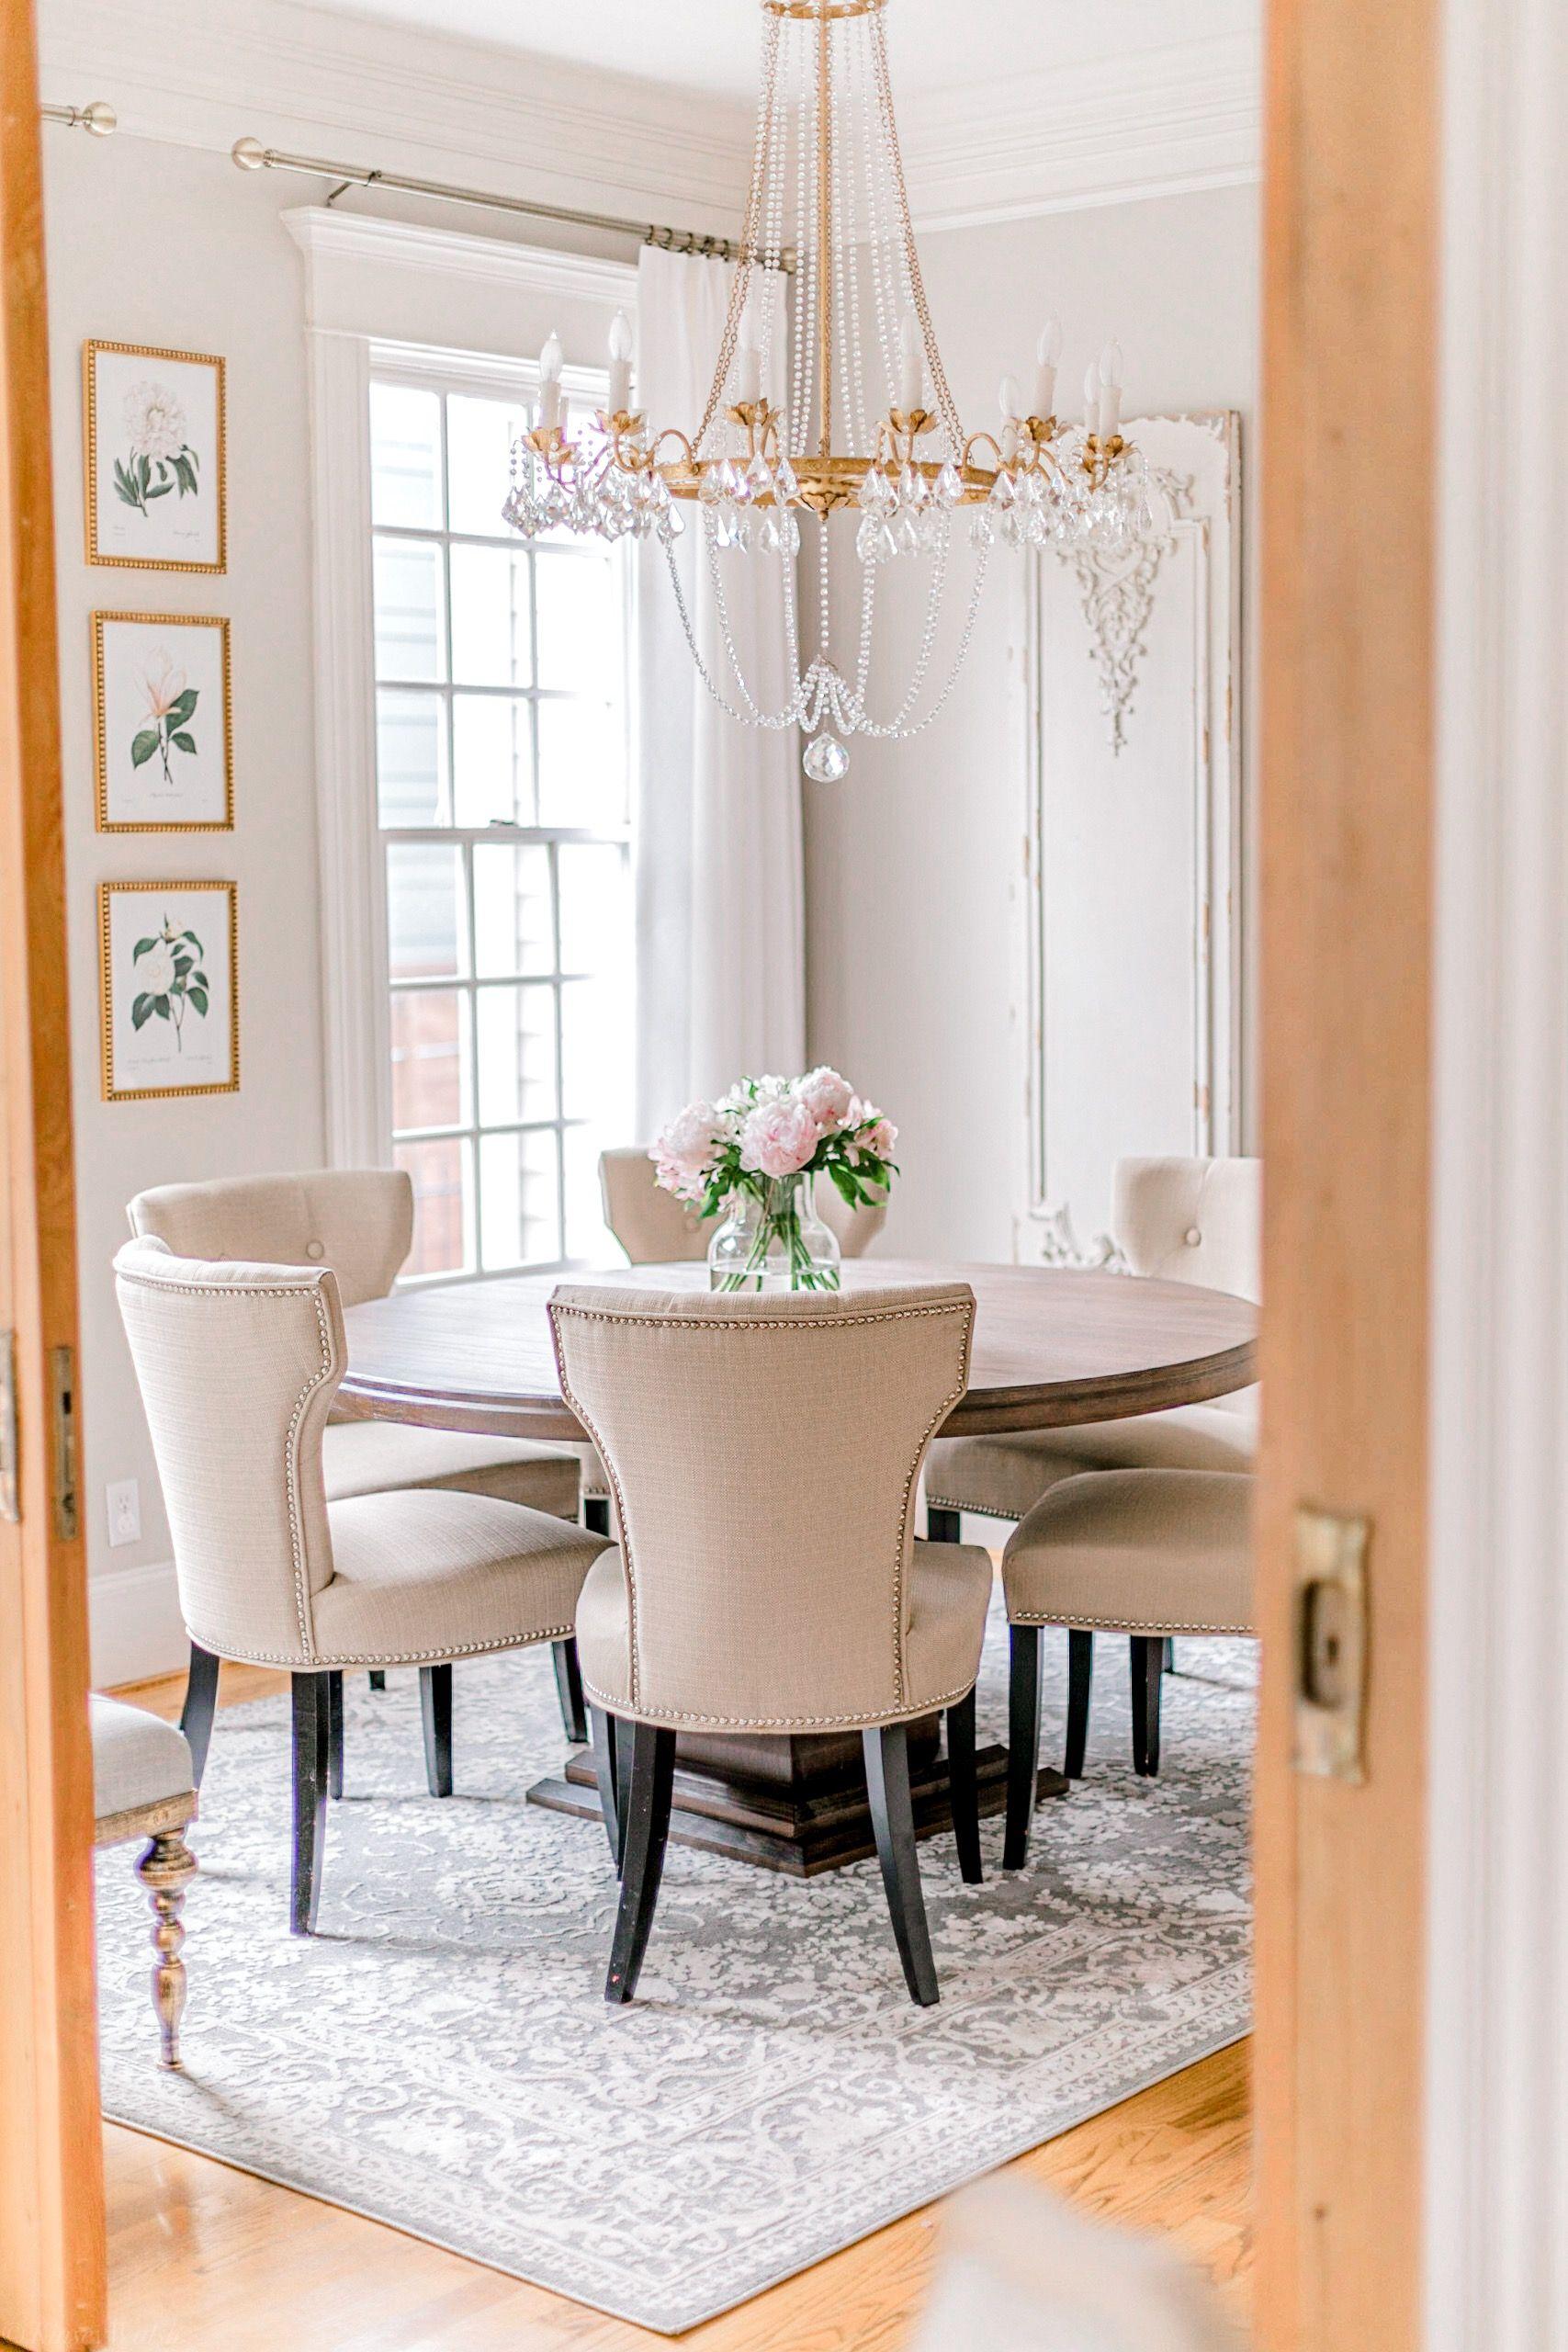 Instagram Roundup June 2019 Kinsey Walsh Beige Dining Room Gold Dining Room Dining Room Rug